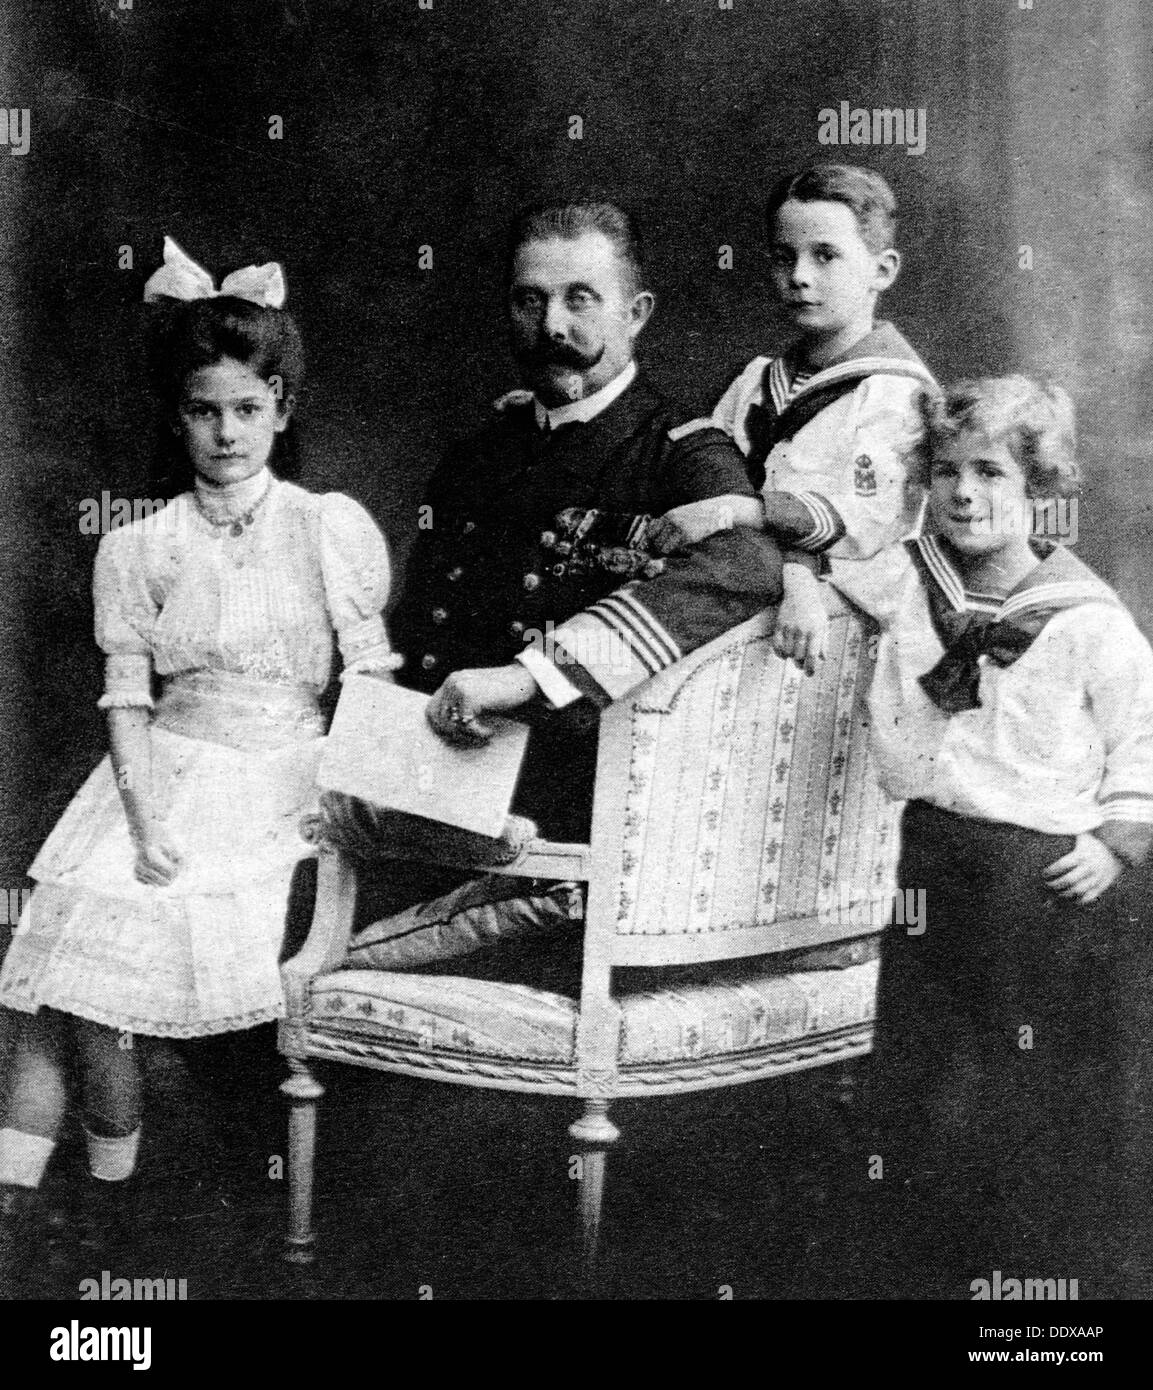 Franz Ferdinand and his children - Stock Image